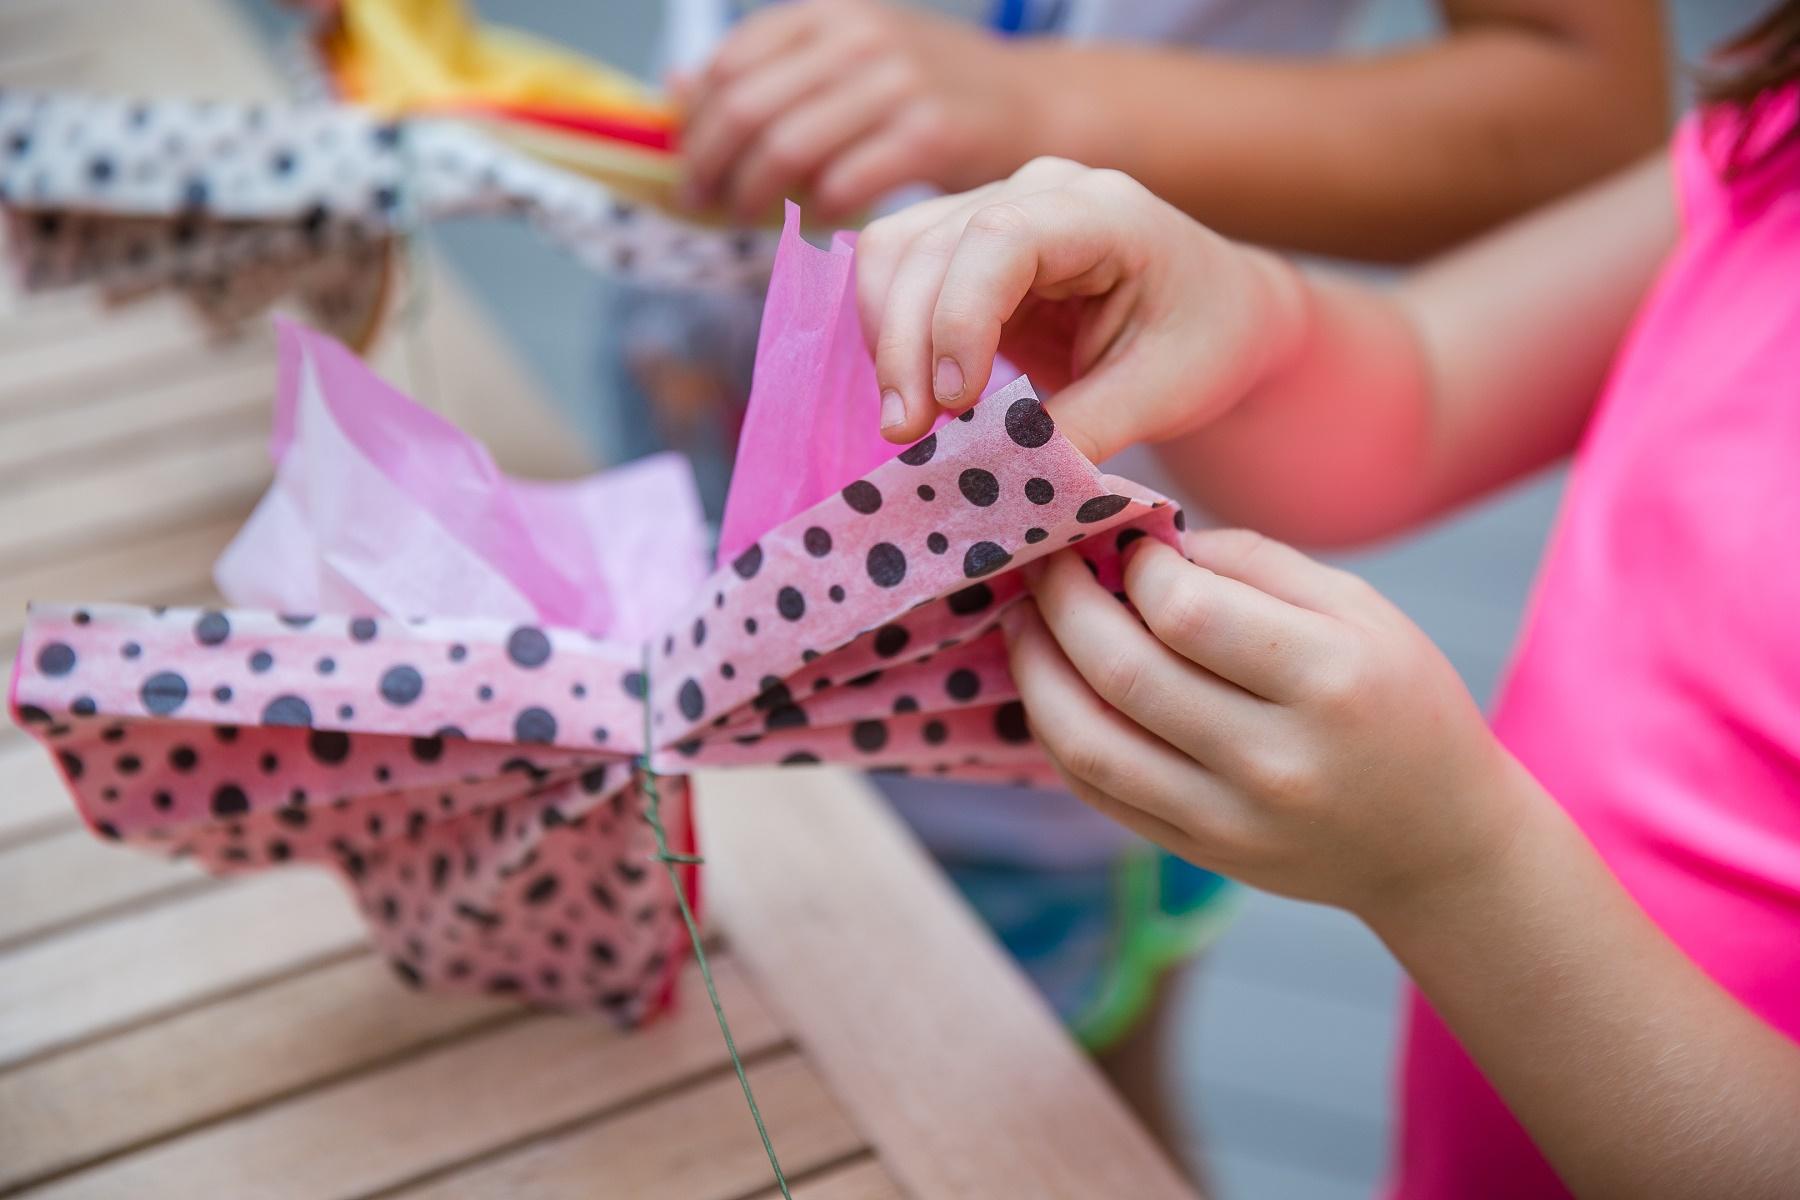 Kids' hands shown making tissue paper flowers